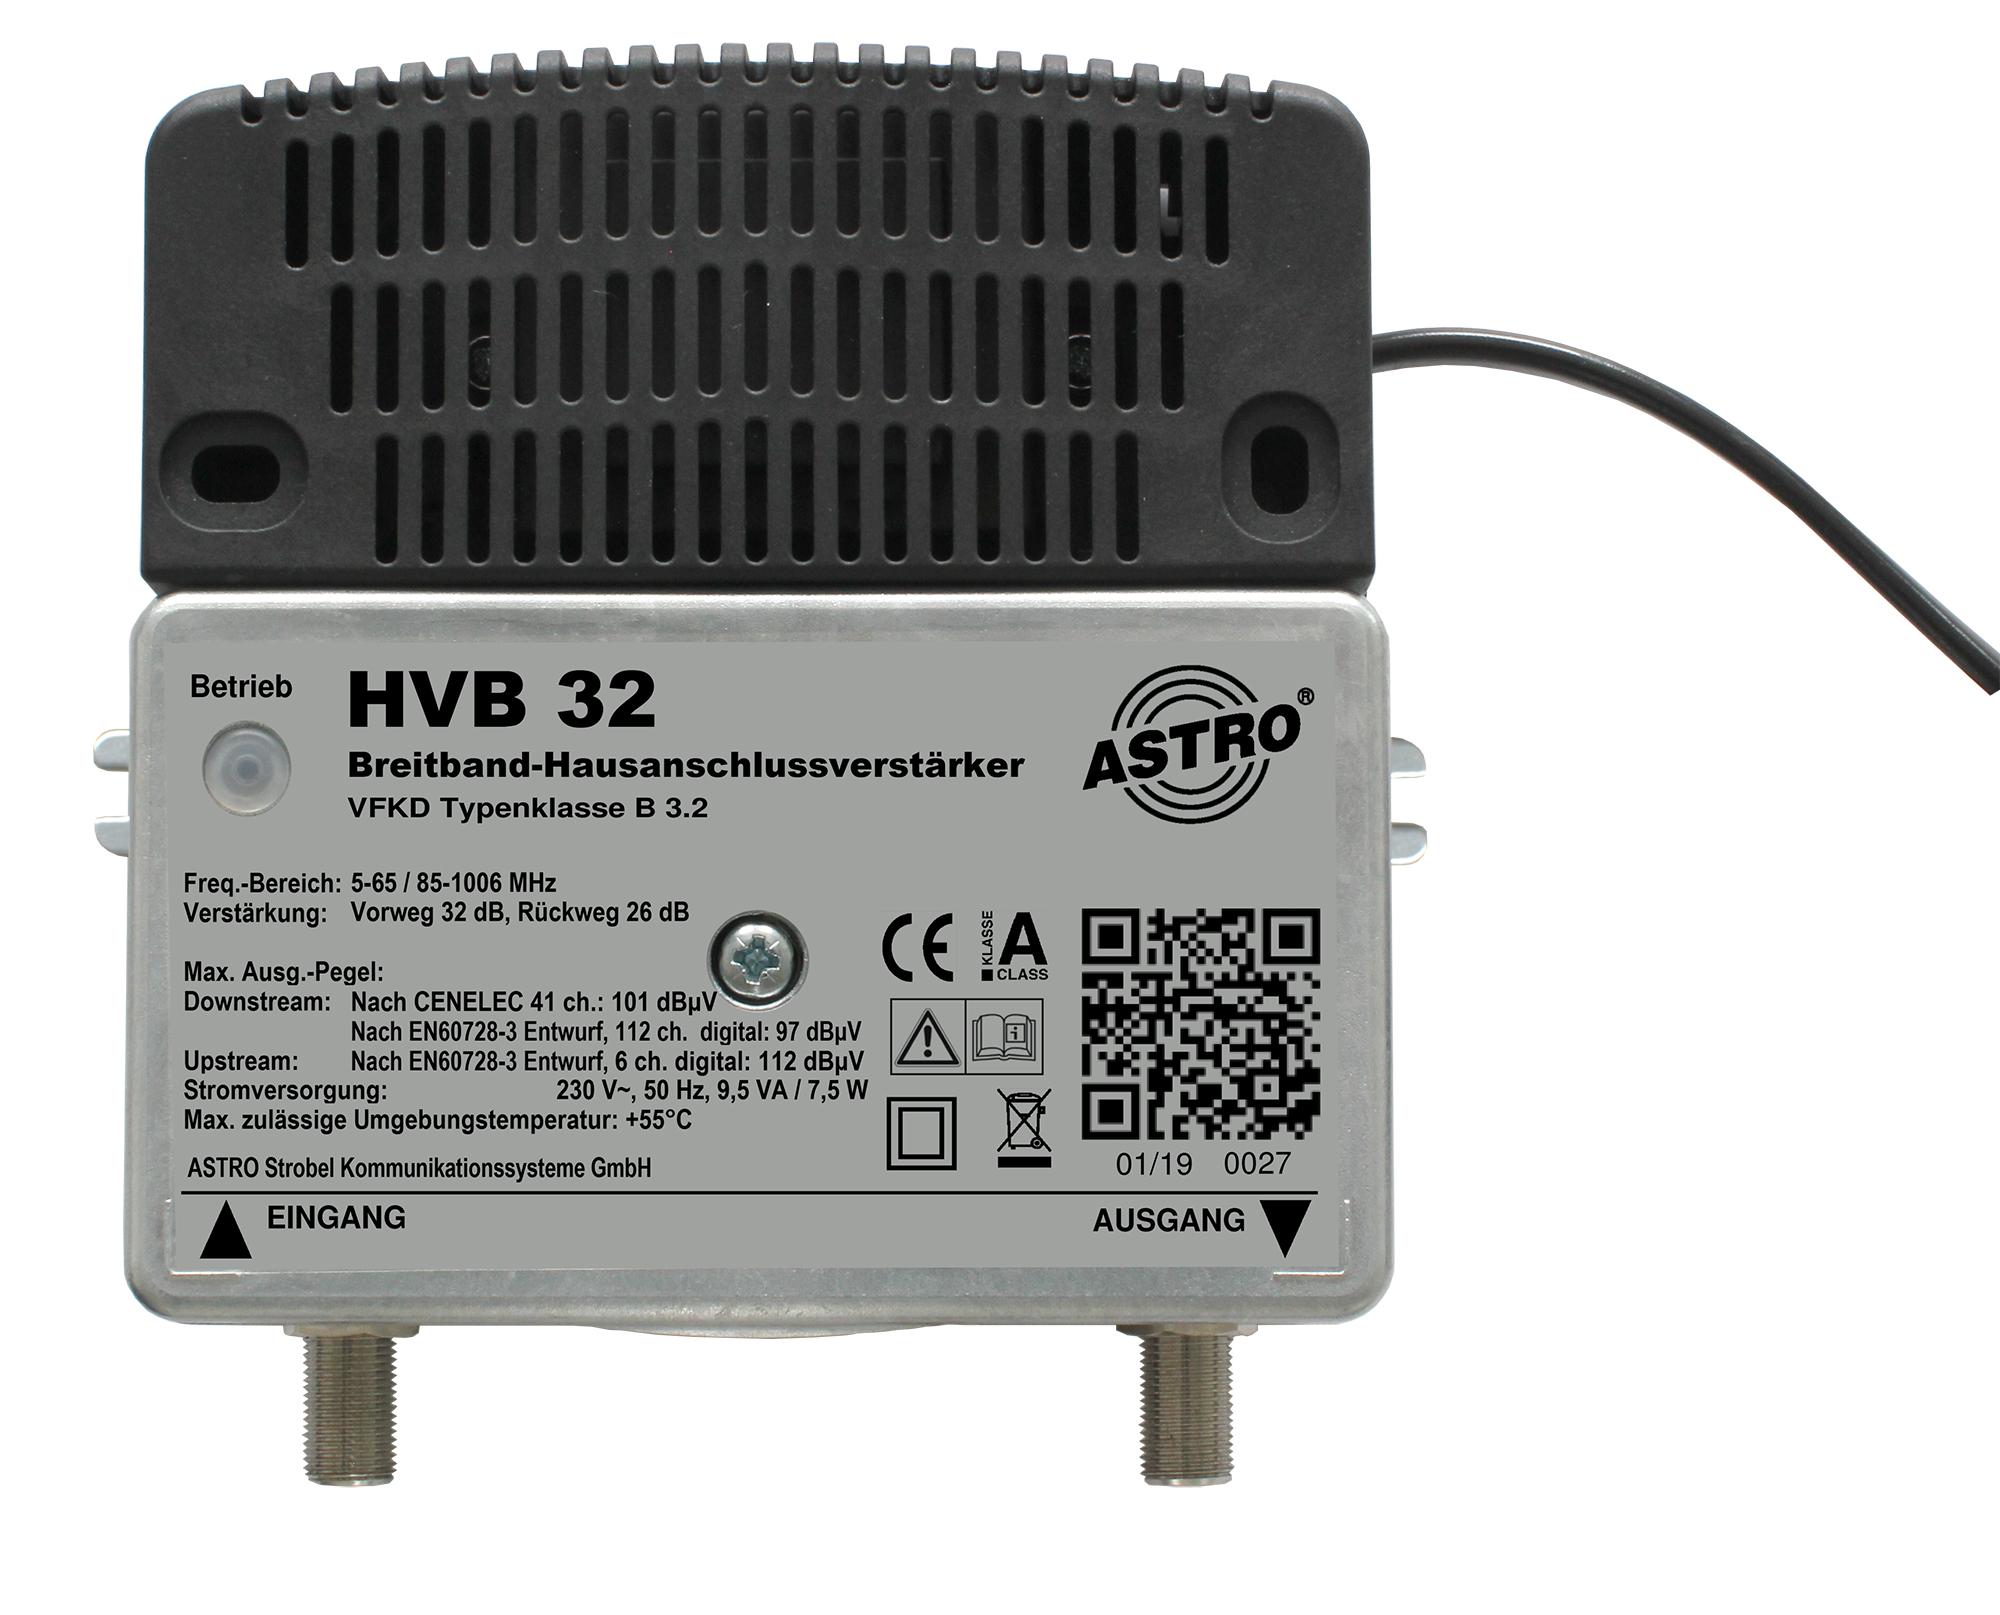 HVB 32 Breitbandverstärker mit 65MHz Rückweg